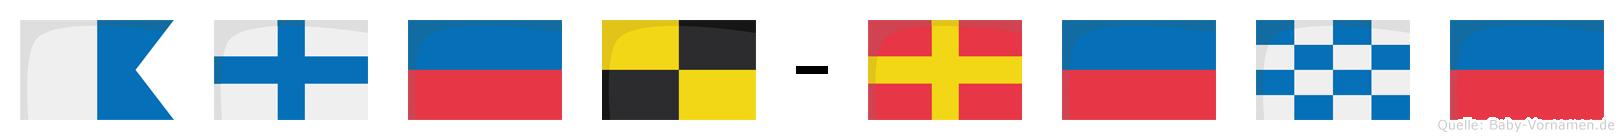 Axel-Rene im Flaggenalphabet